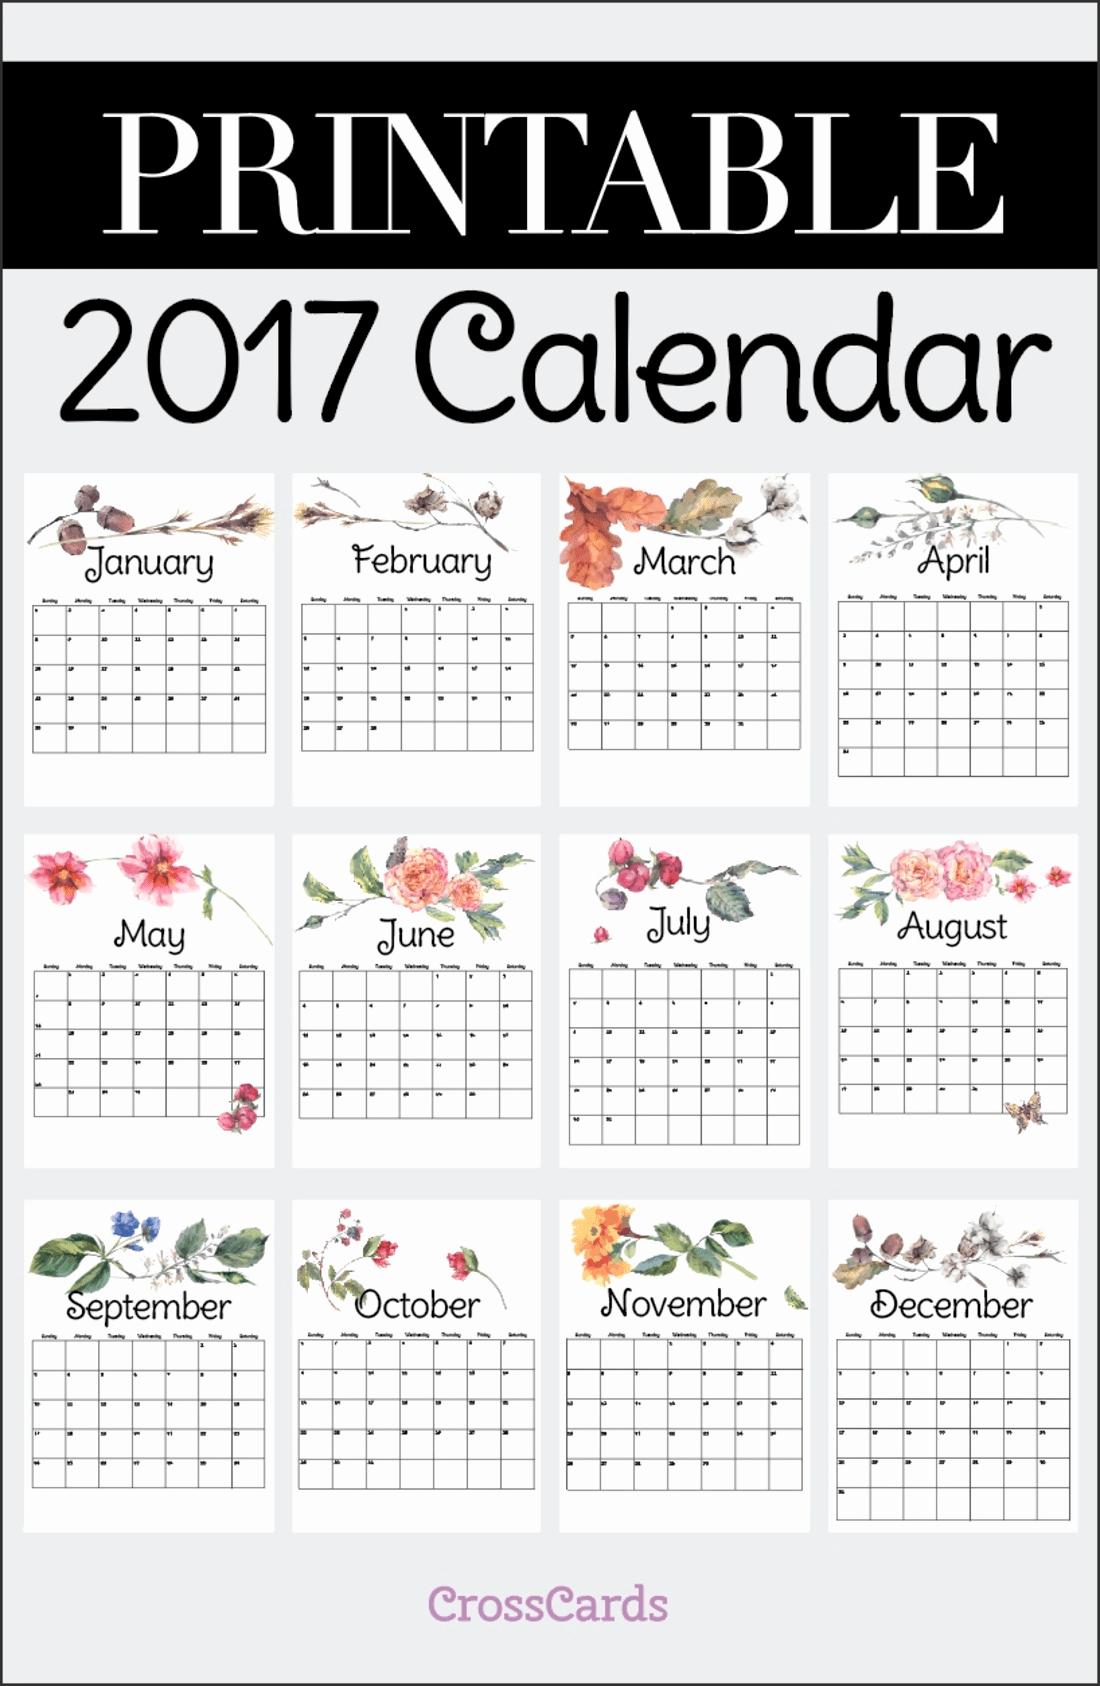 Free Download Of 2017 Calendar Beautiful Free Printable 2017 Calendar Printable Download Free